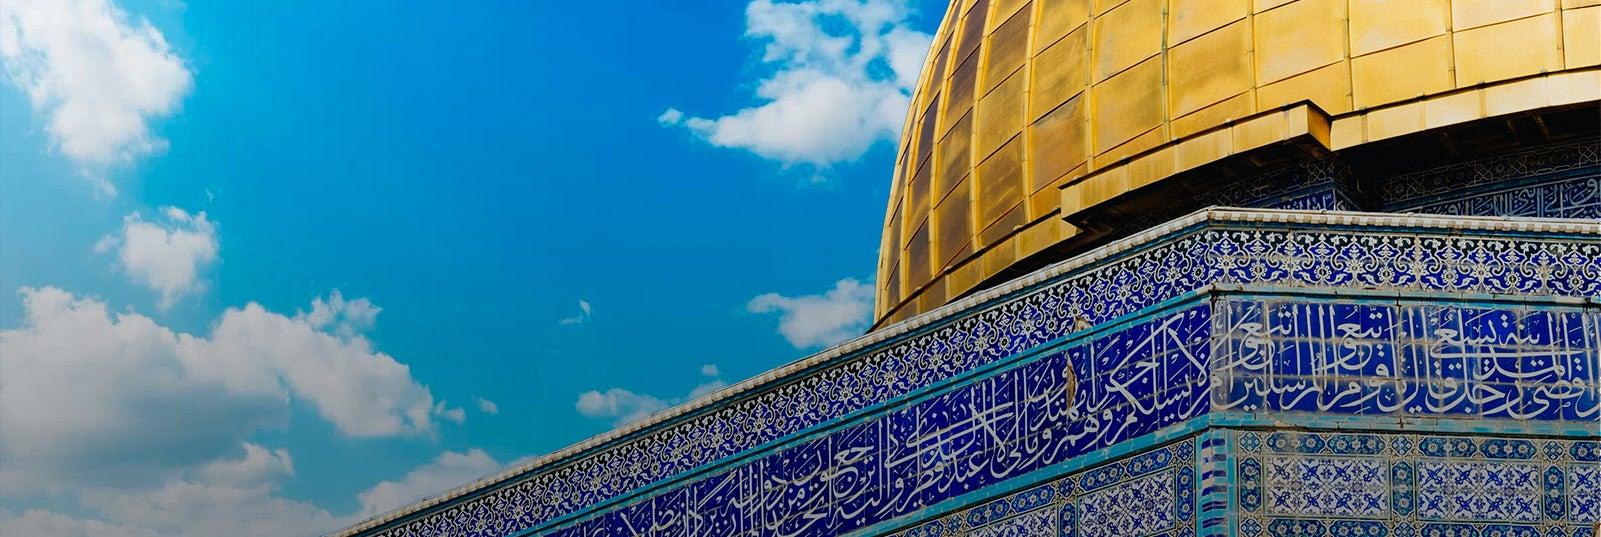 Guía turística de Jerusalén